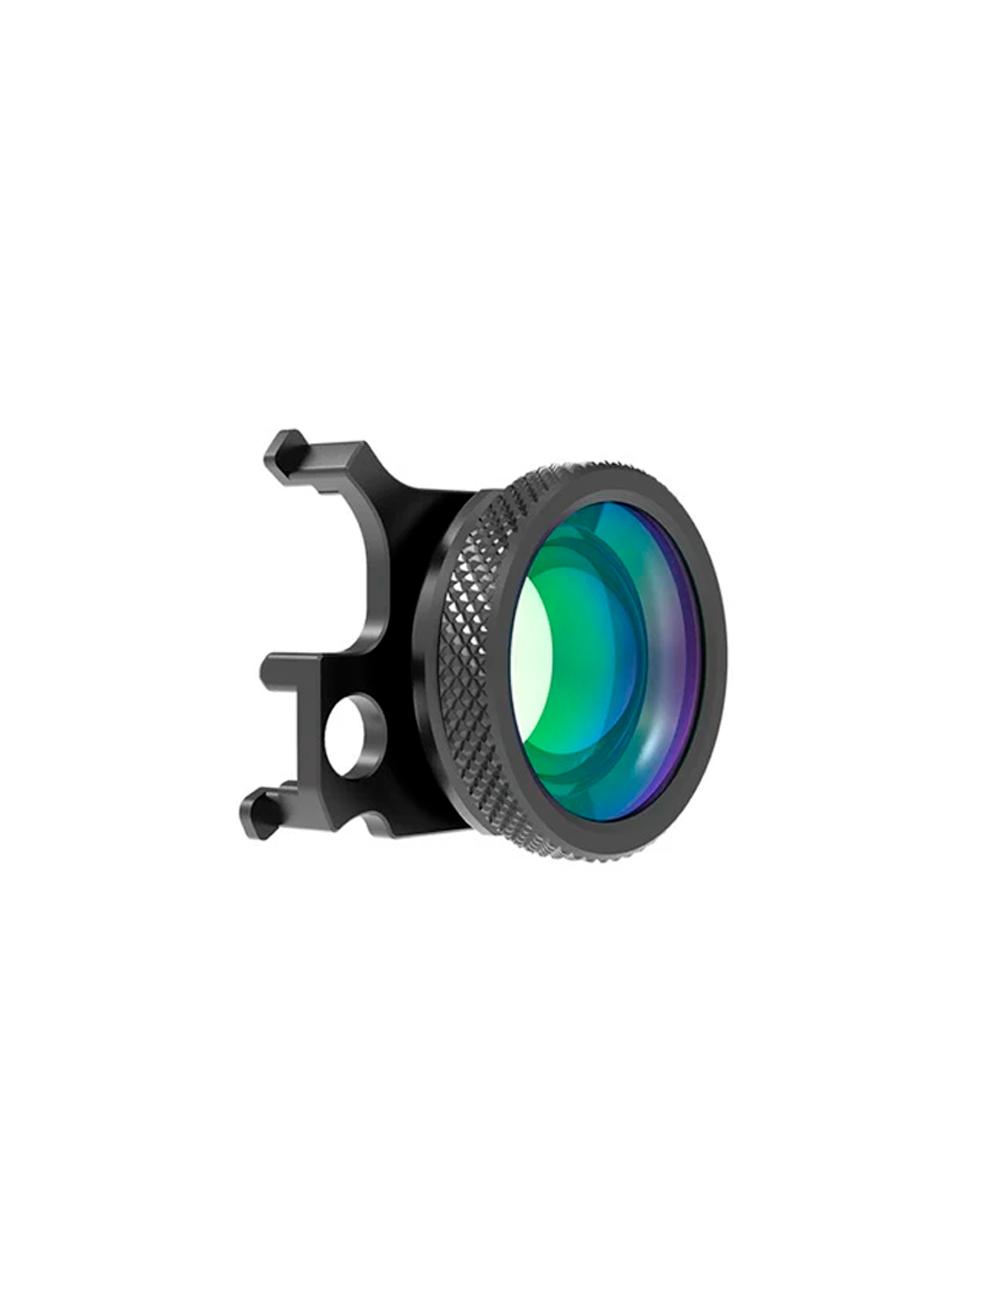 Caña de audio - 5 METROS - E-image Profesional BC-16 de Fibra de Carbono - puedes pasar cable por su interior